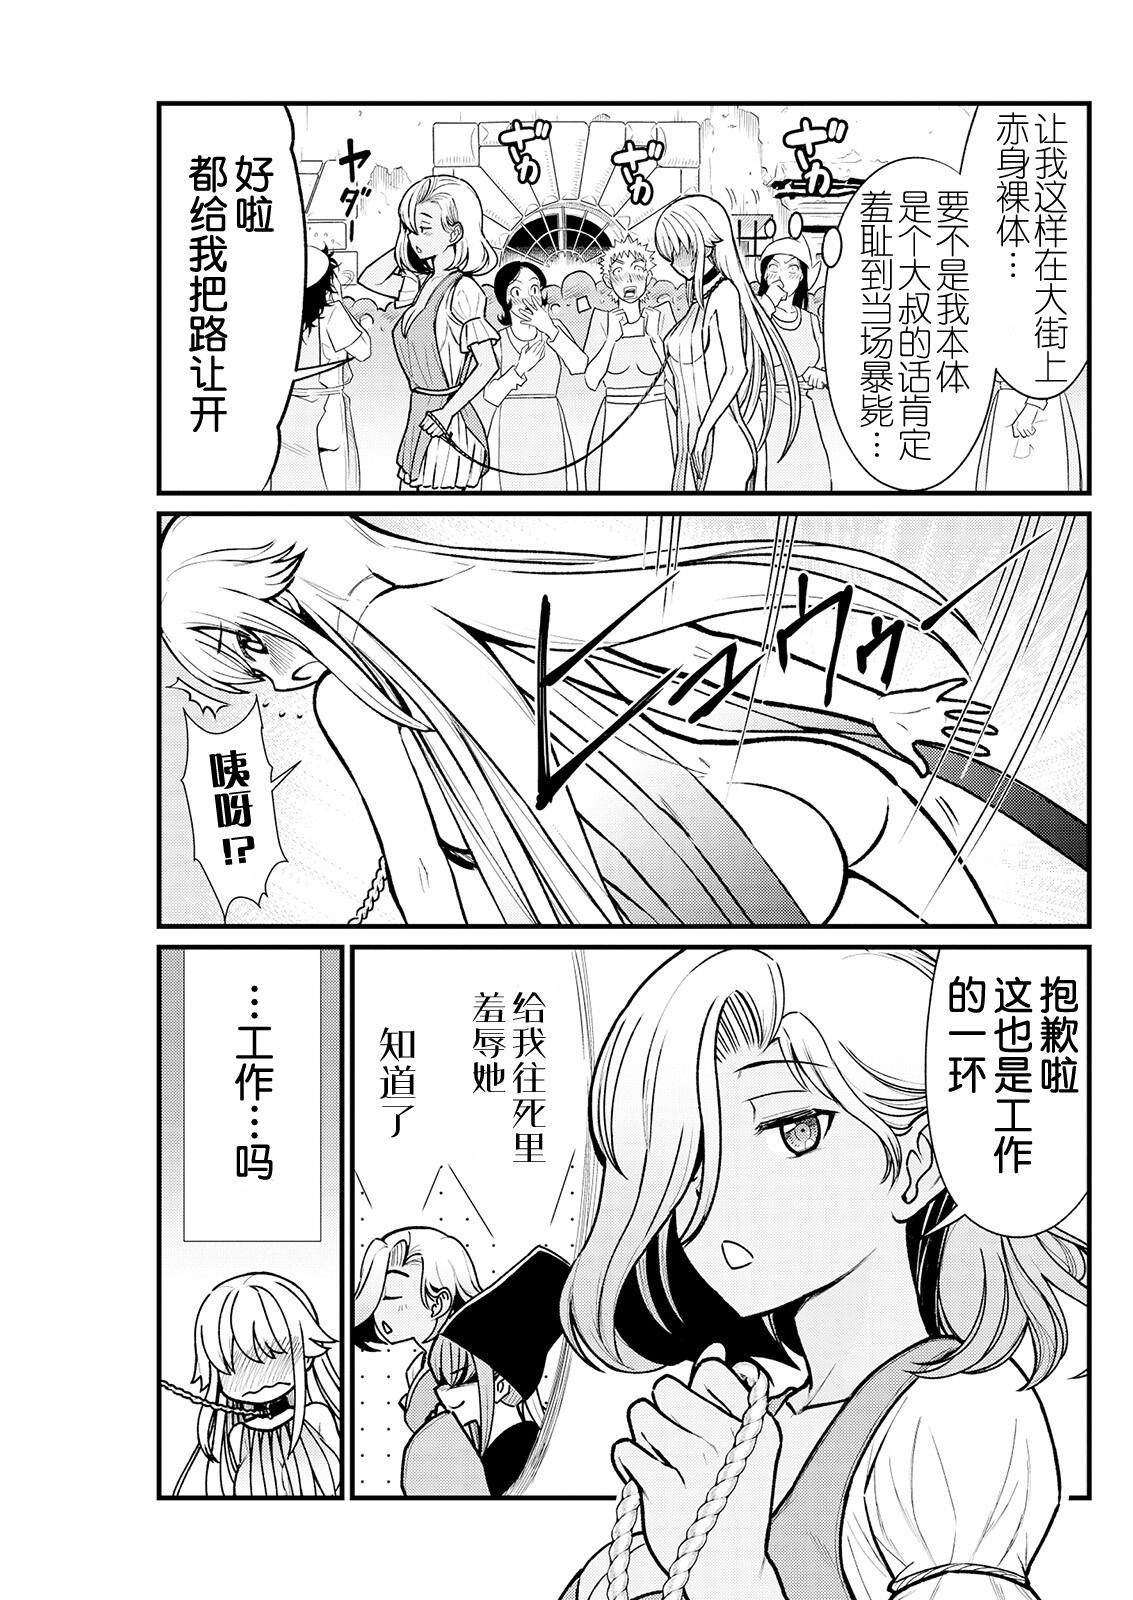 kuxtu koro se no hime kisi to nari, yuri syoukan de hatara ku koto ni nari masi ta. 3 (chinese)(鬼畜王汉化组) 5